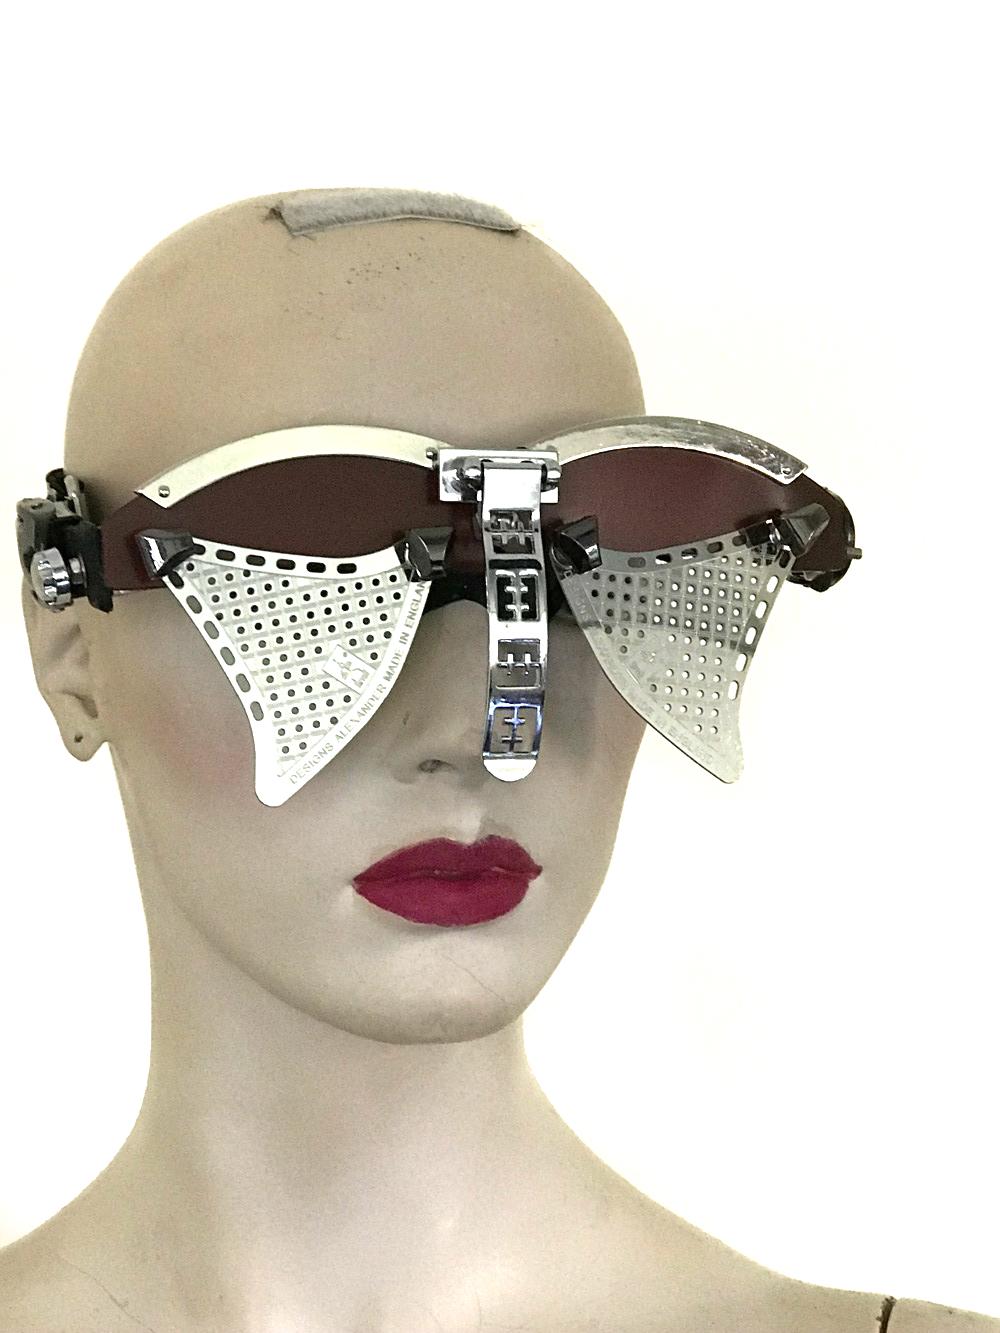 handmade futuristic modern steampunk eyewear for artists Spartan nose shield metal lens burgundy face